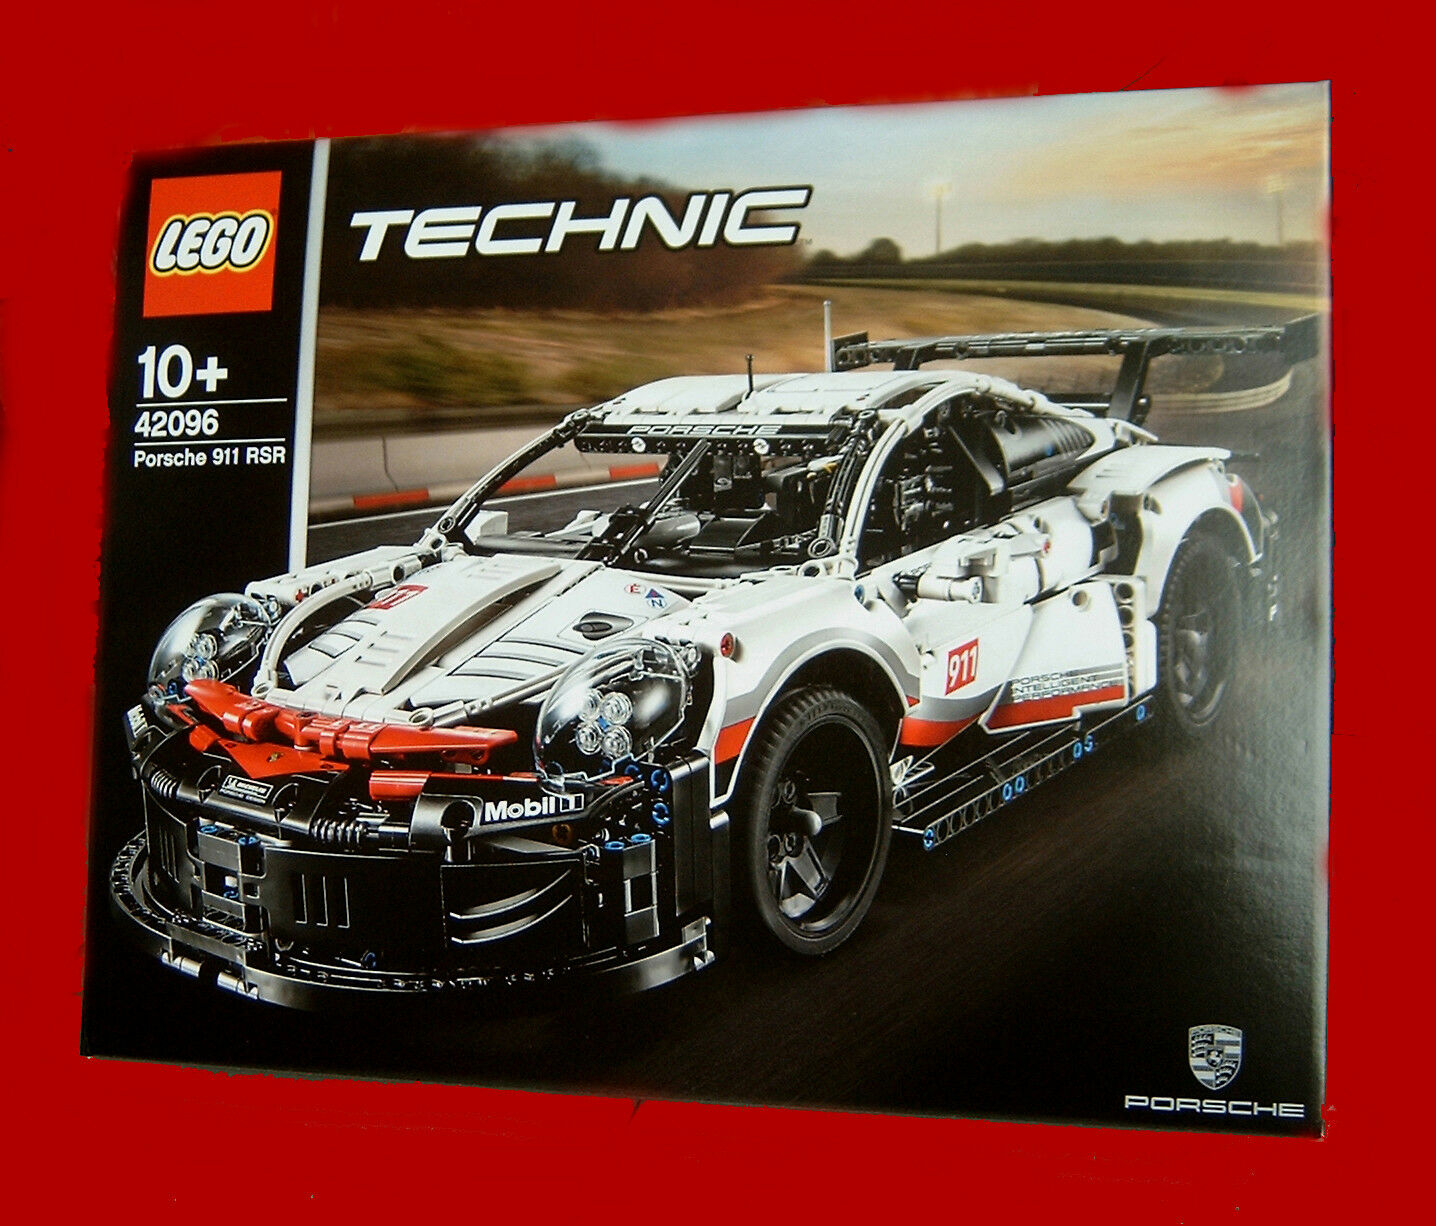 LEGO Technic 42096 Porsche 911 RSR Neuheit 2019 NEU/OVP sofort lieferbar